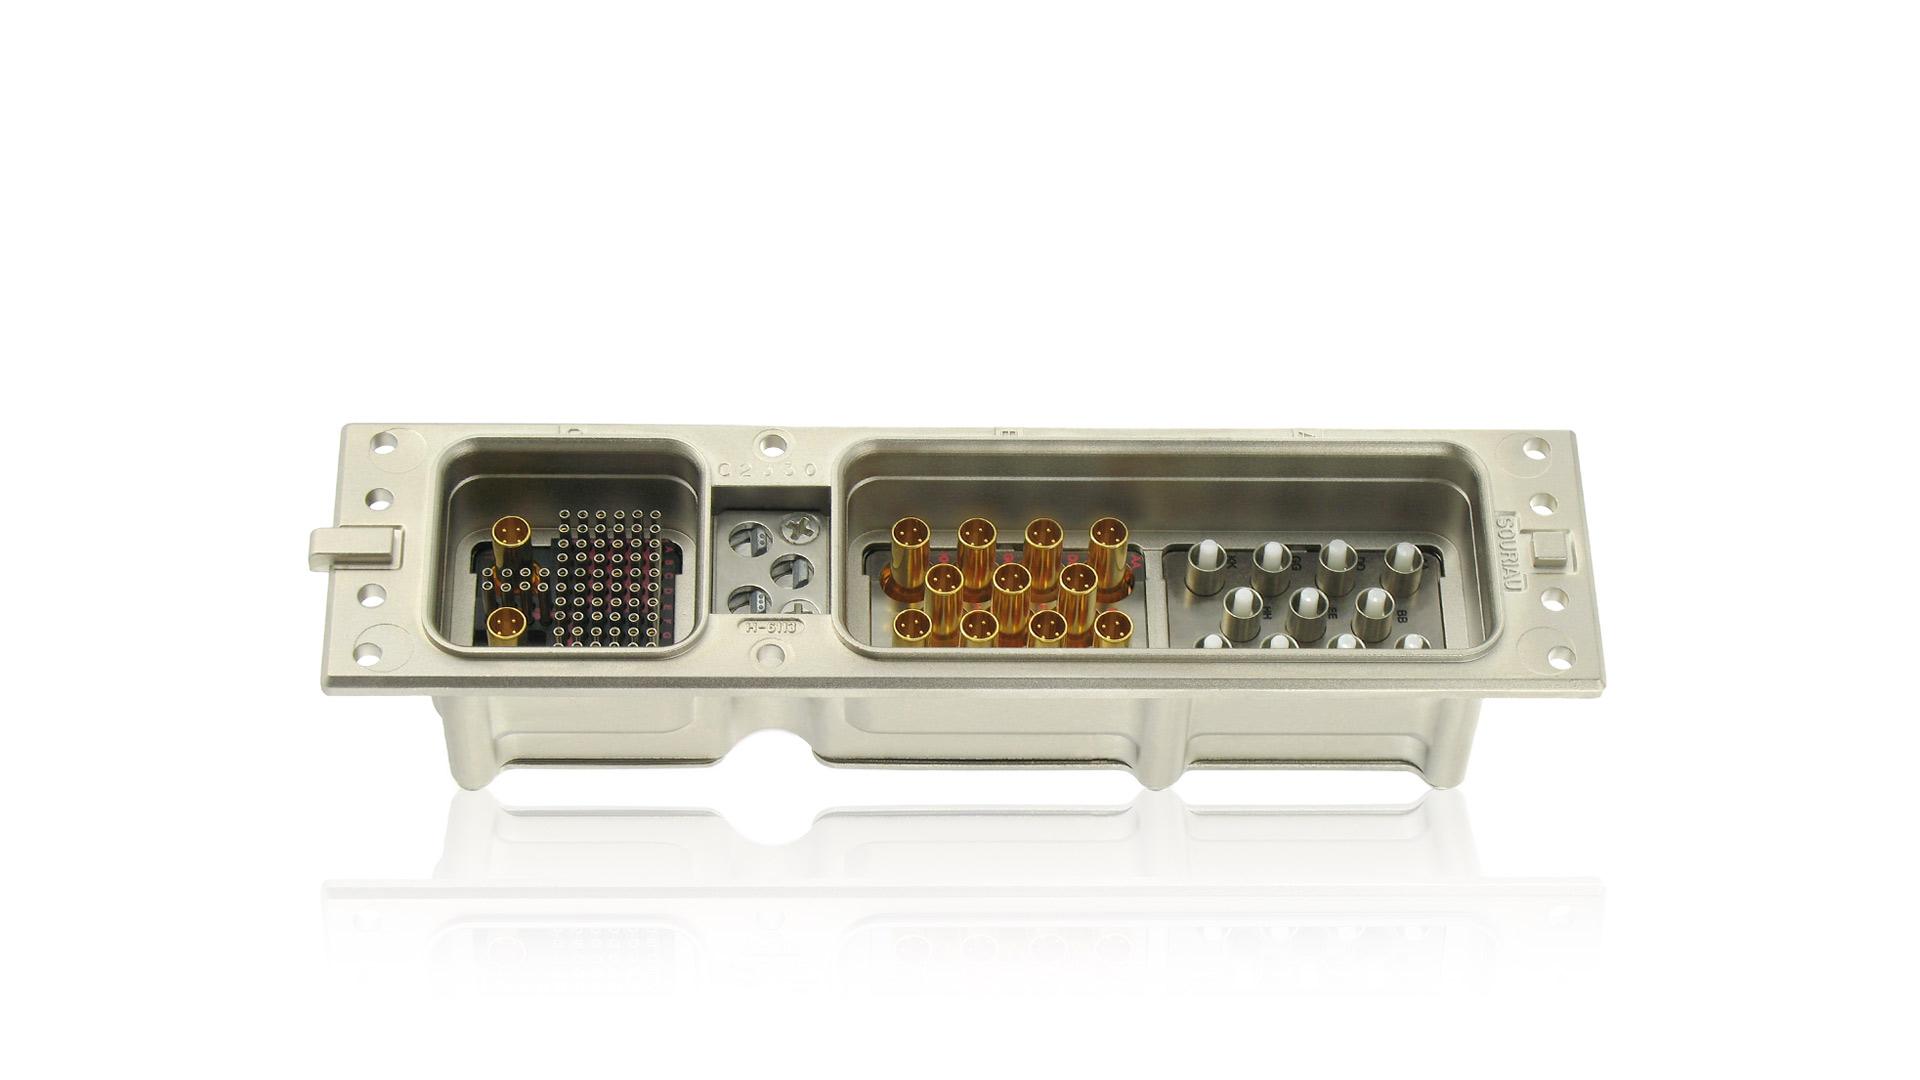 ARINC600 Series